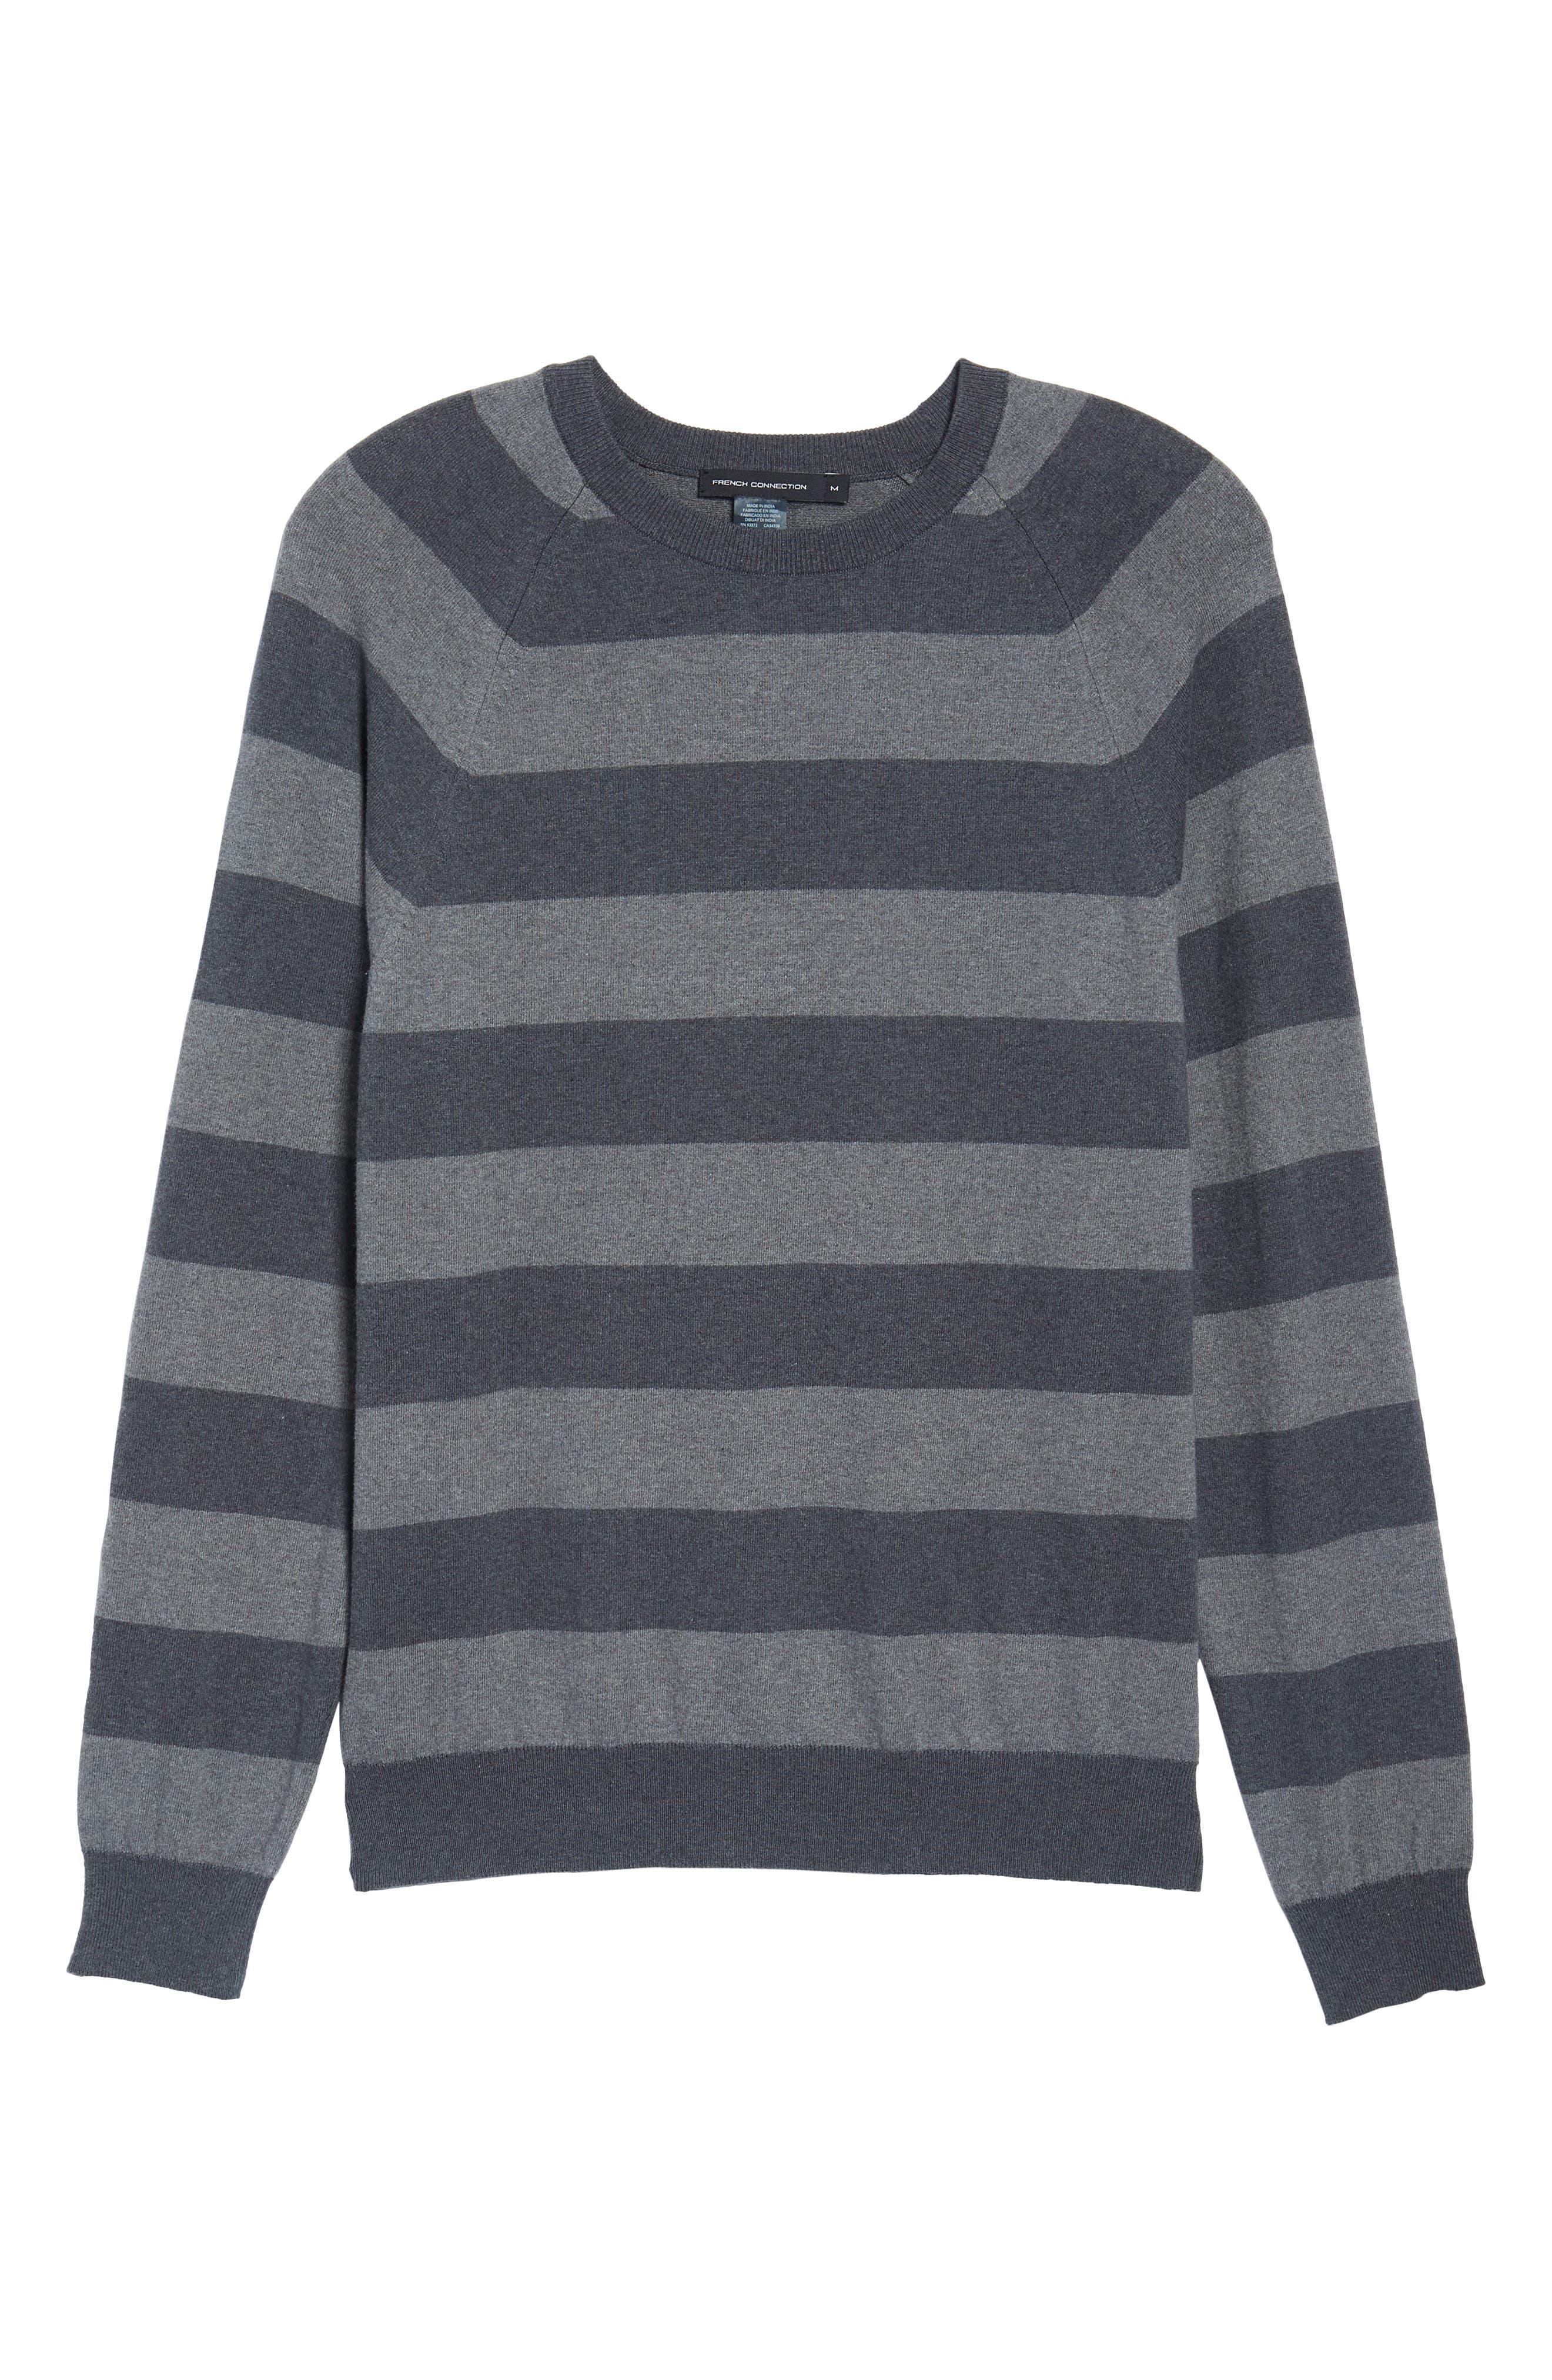 Stripe Stretch Cotton Sweater,                             Alternate thumbnail 6, color,                             Mid Grey/ Charcoal Melange